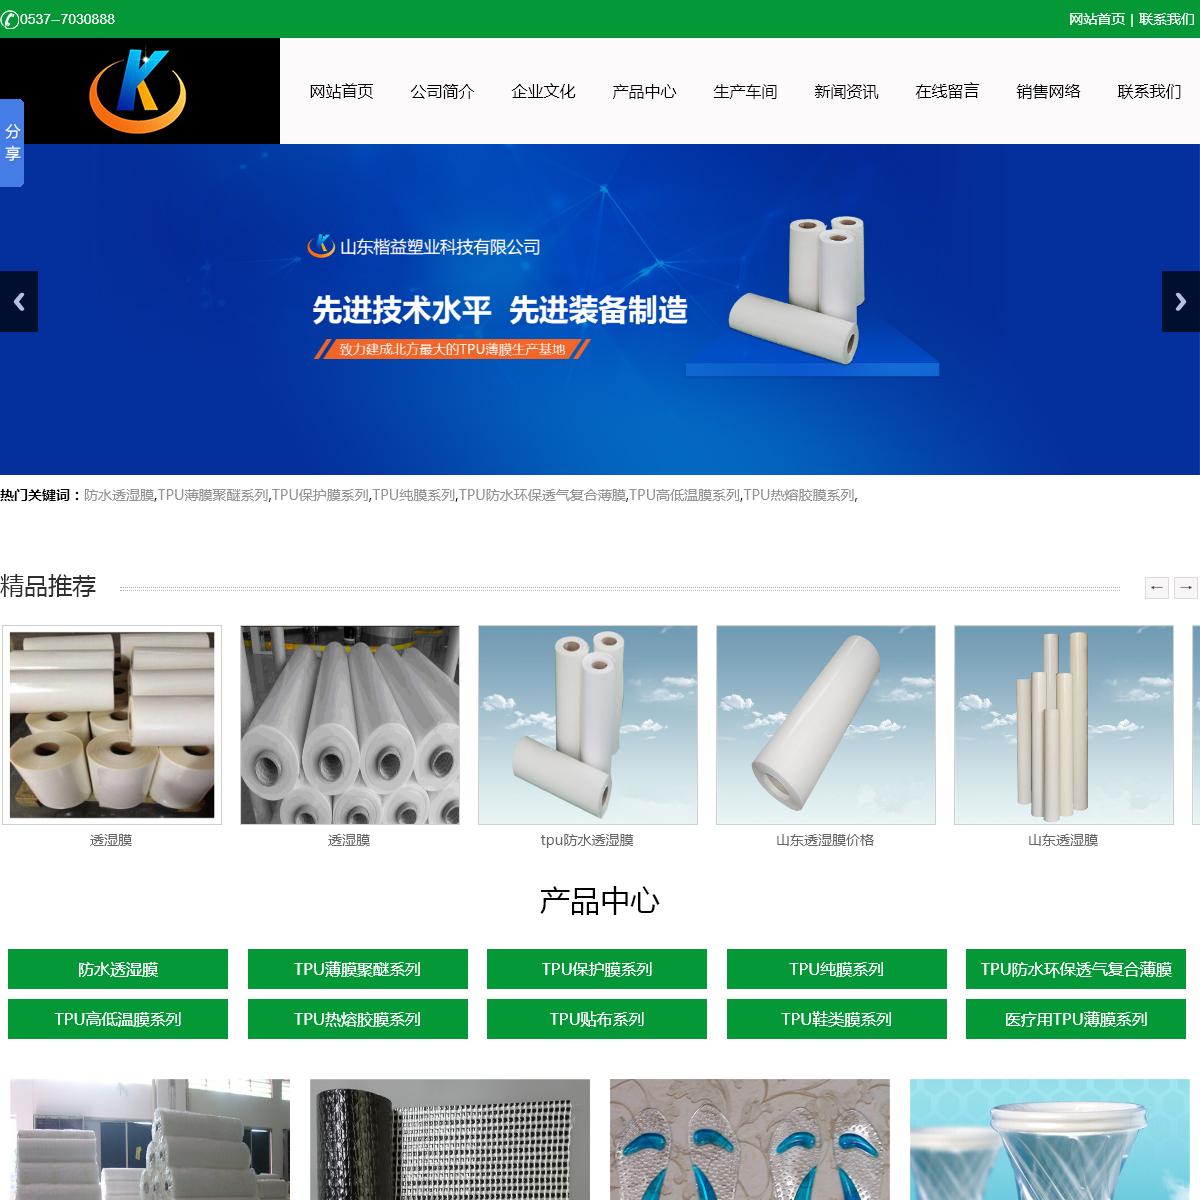 TPU环保复合膜_tpu防水透气膜_山东楷益塑业科技有限公司